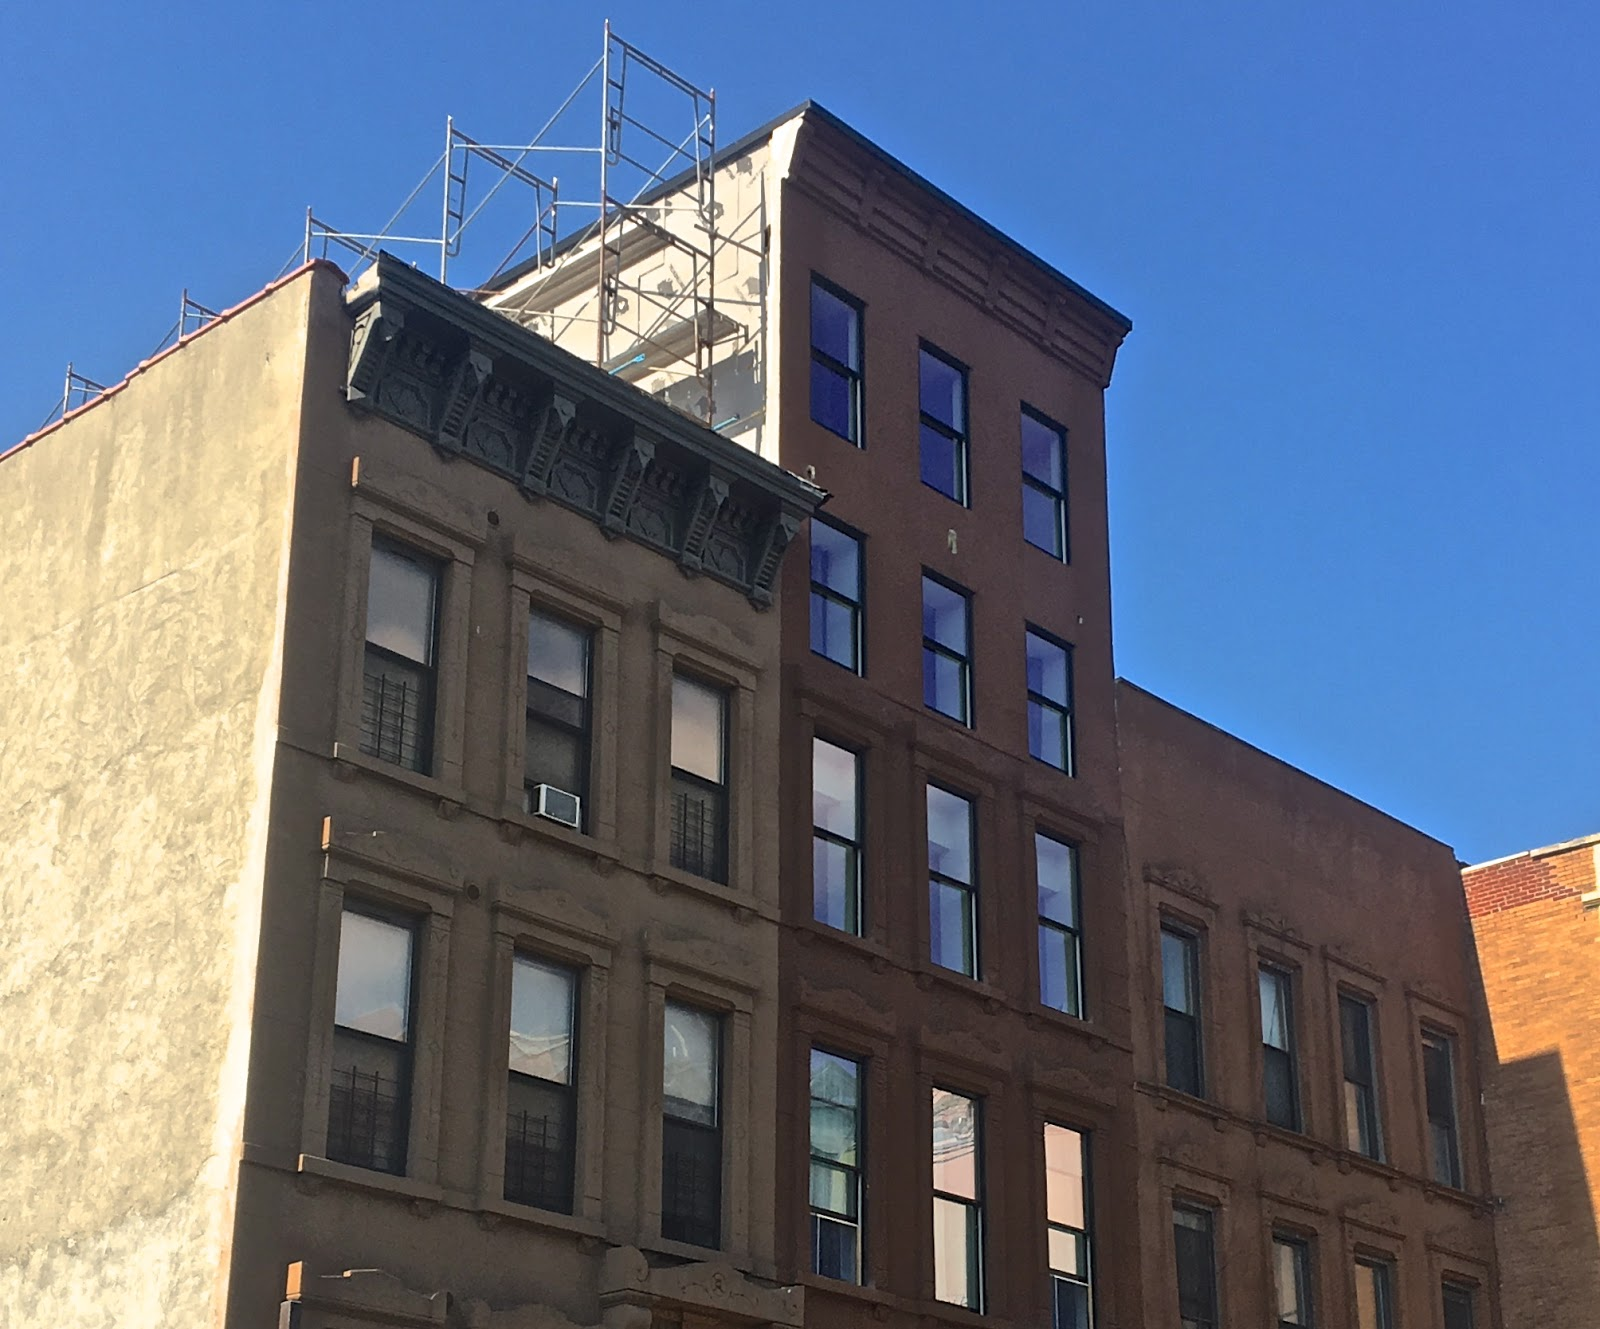 68 West 126th Street